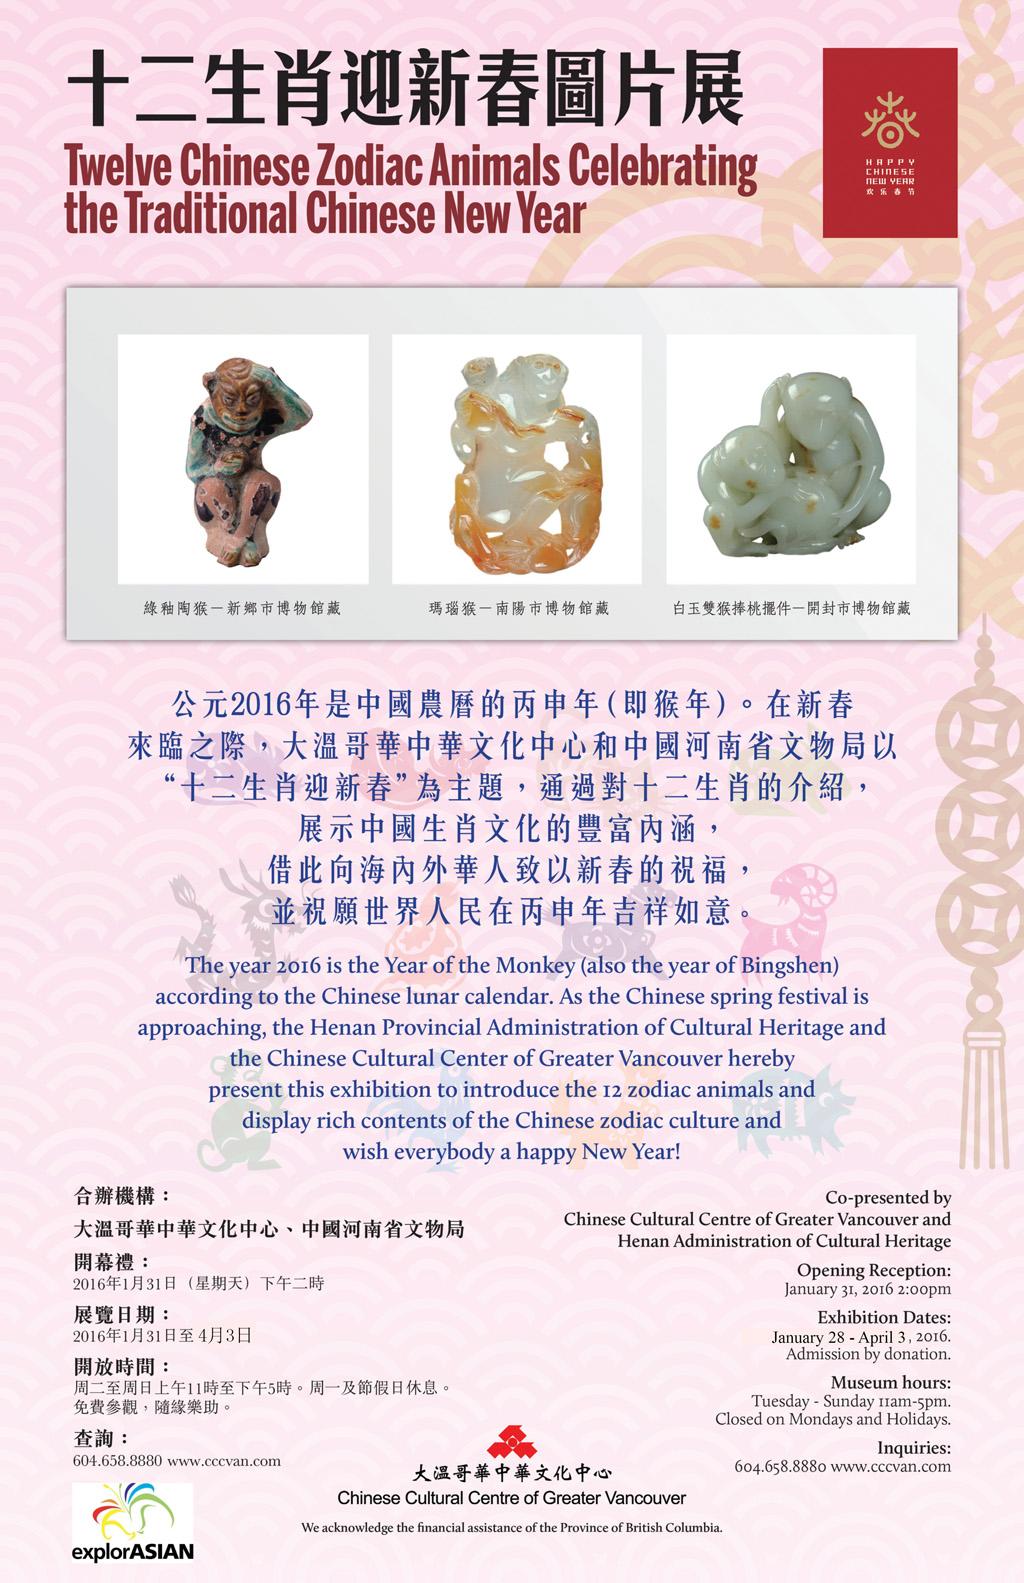 exhibition of chinese zodiac celebrating the traditional chinese new year - Chinese New Year 2016 Date